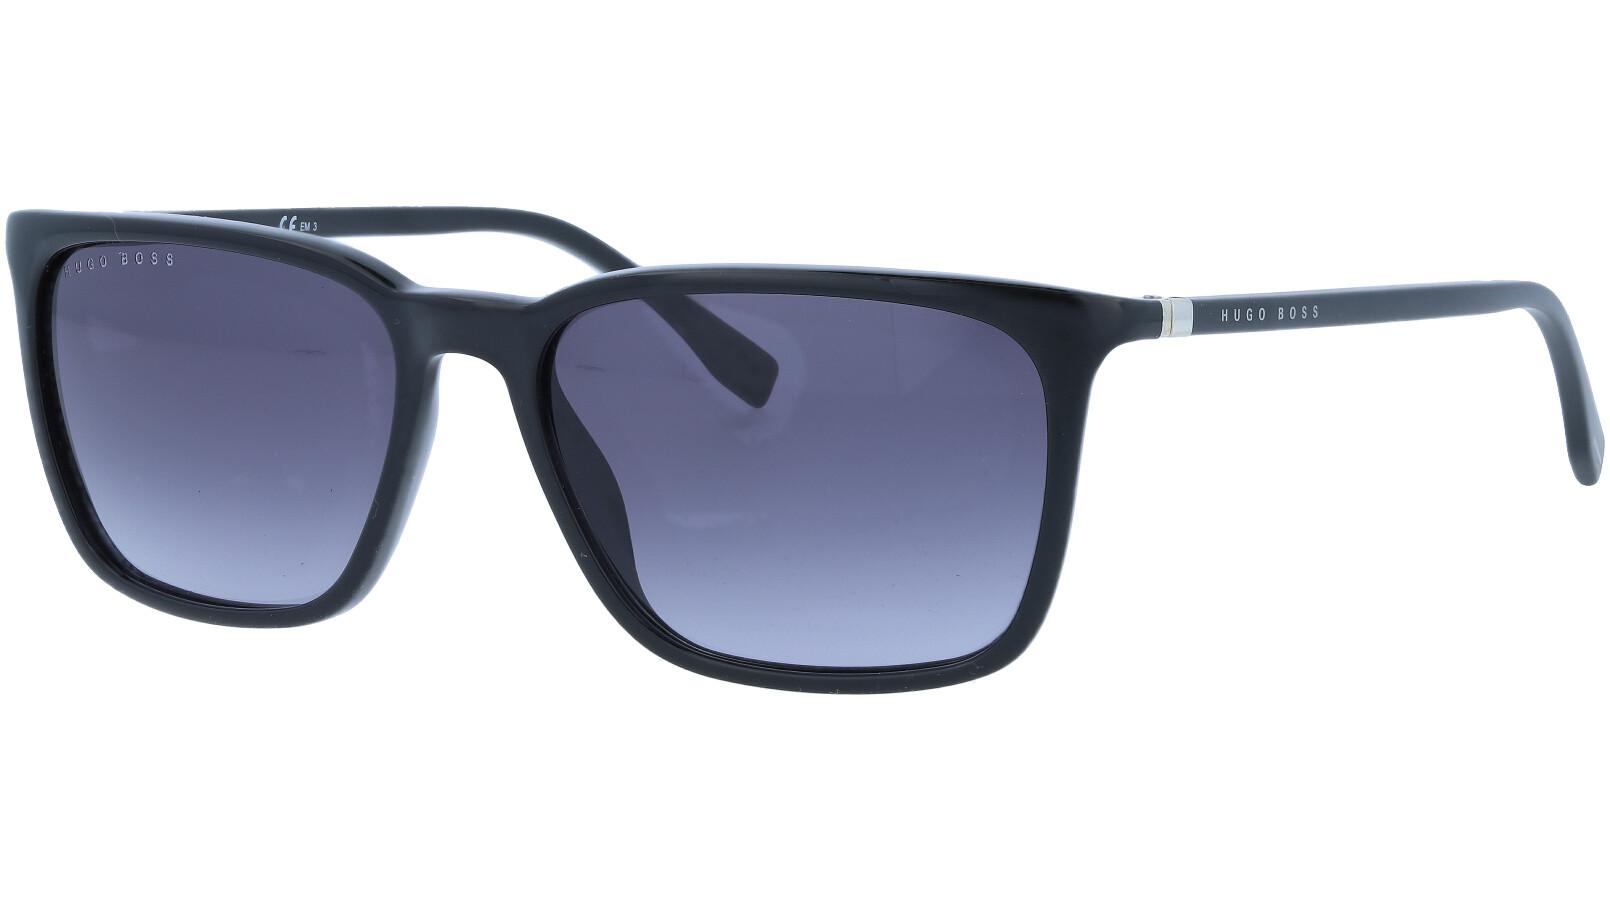 Hugo Boss BOSS0959S 003M9 53 Matt Sunglasses